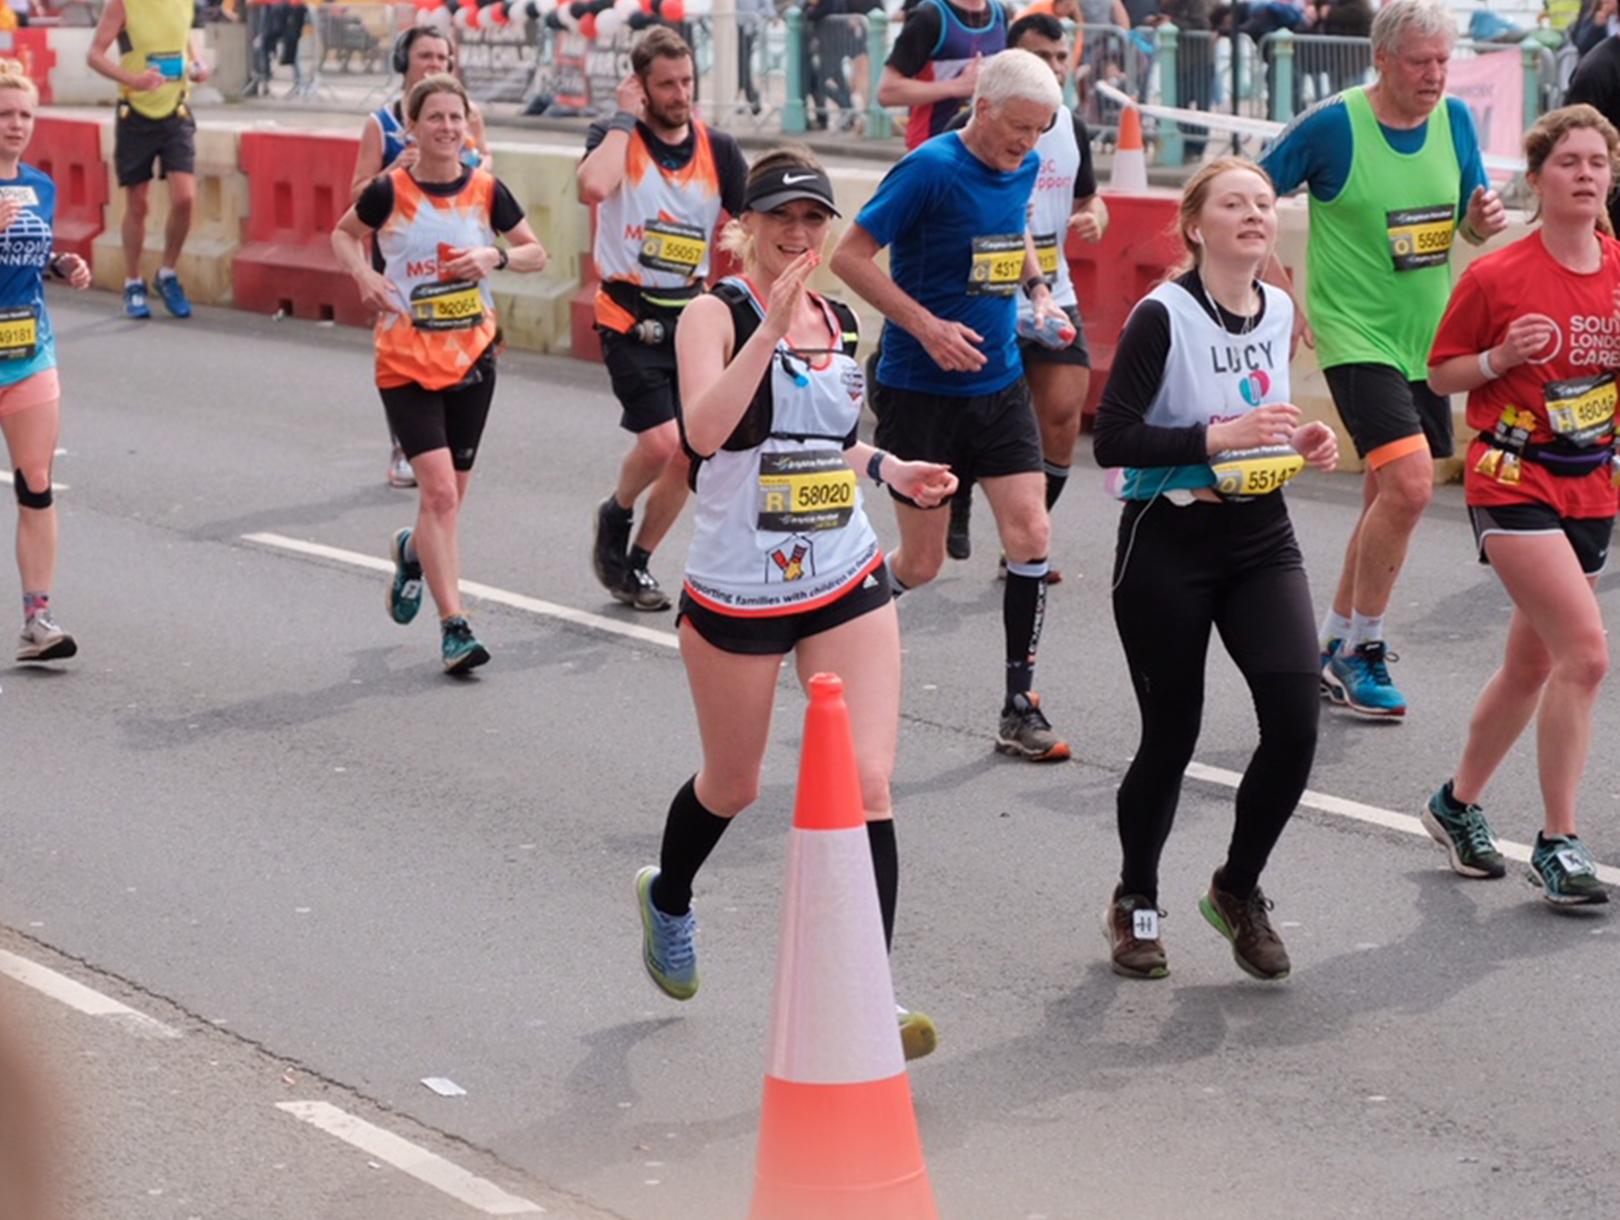 Cardiff Half Marathon 2021